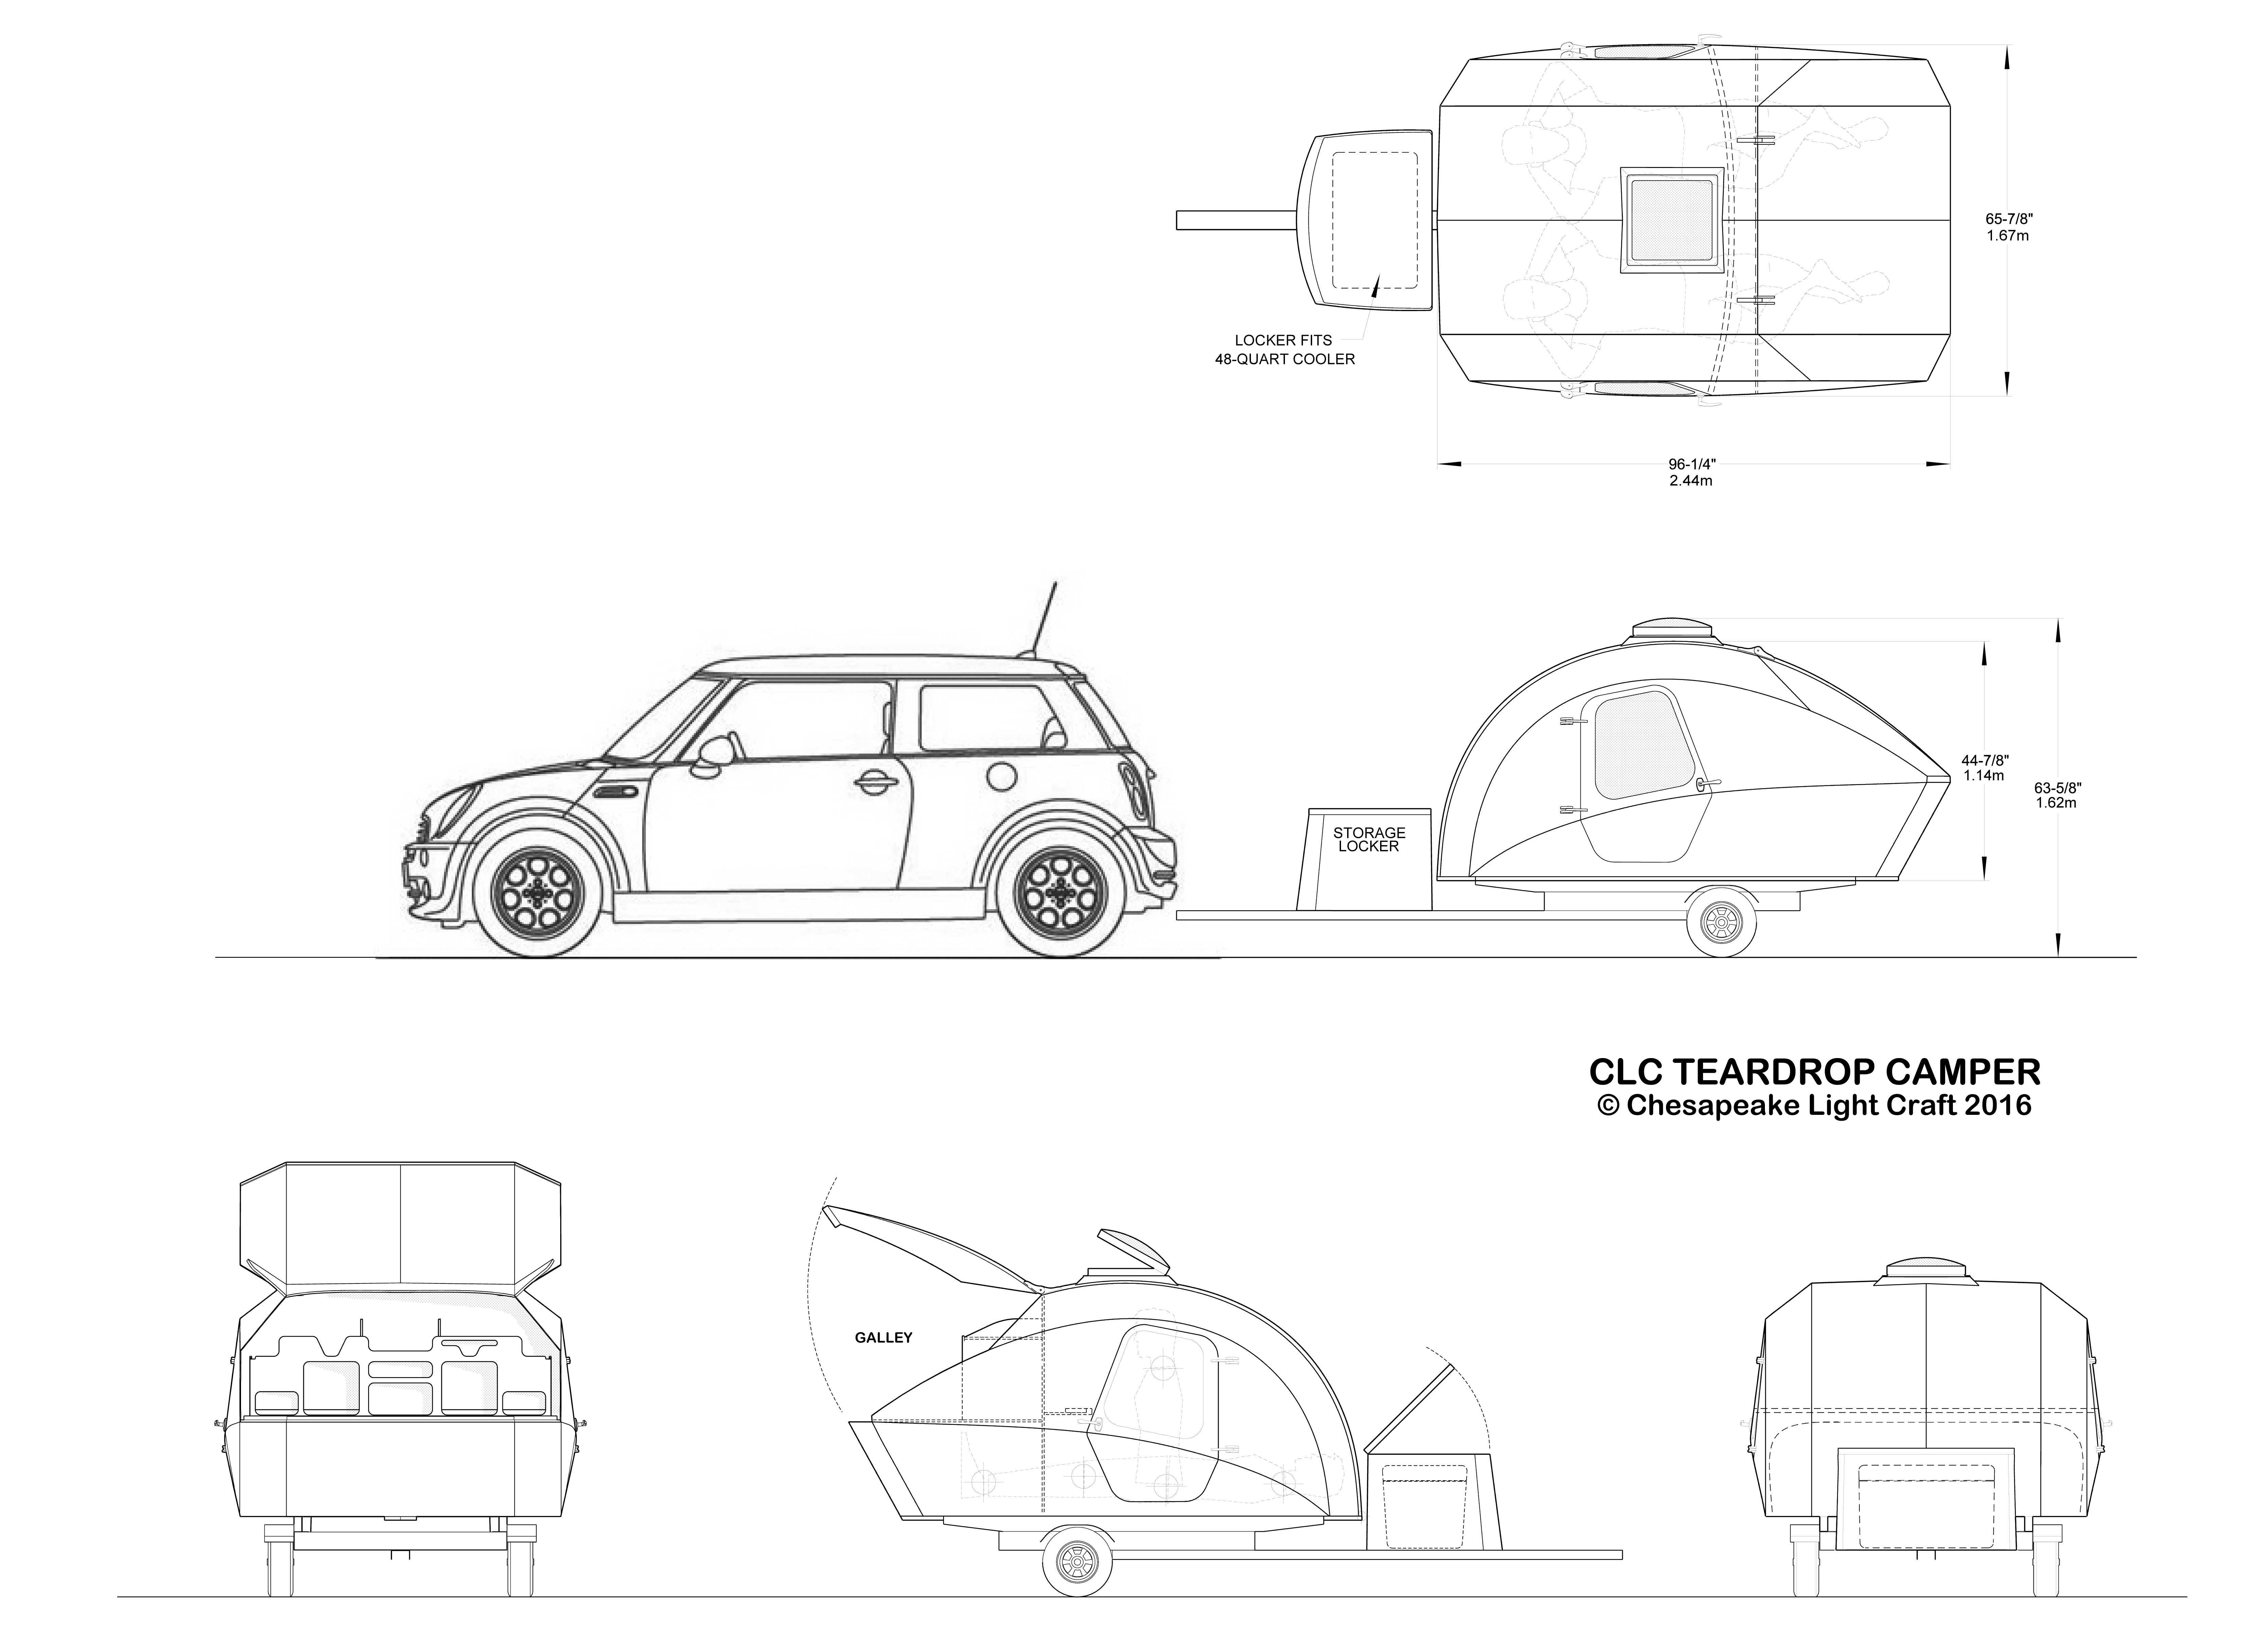 Teardrop Camper Official Lines.jpg 6,672×4,800 pixels